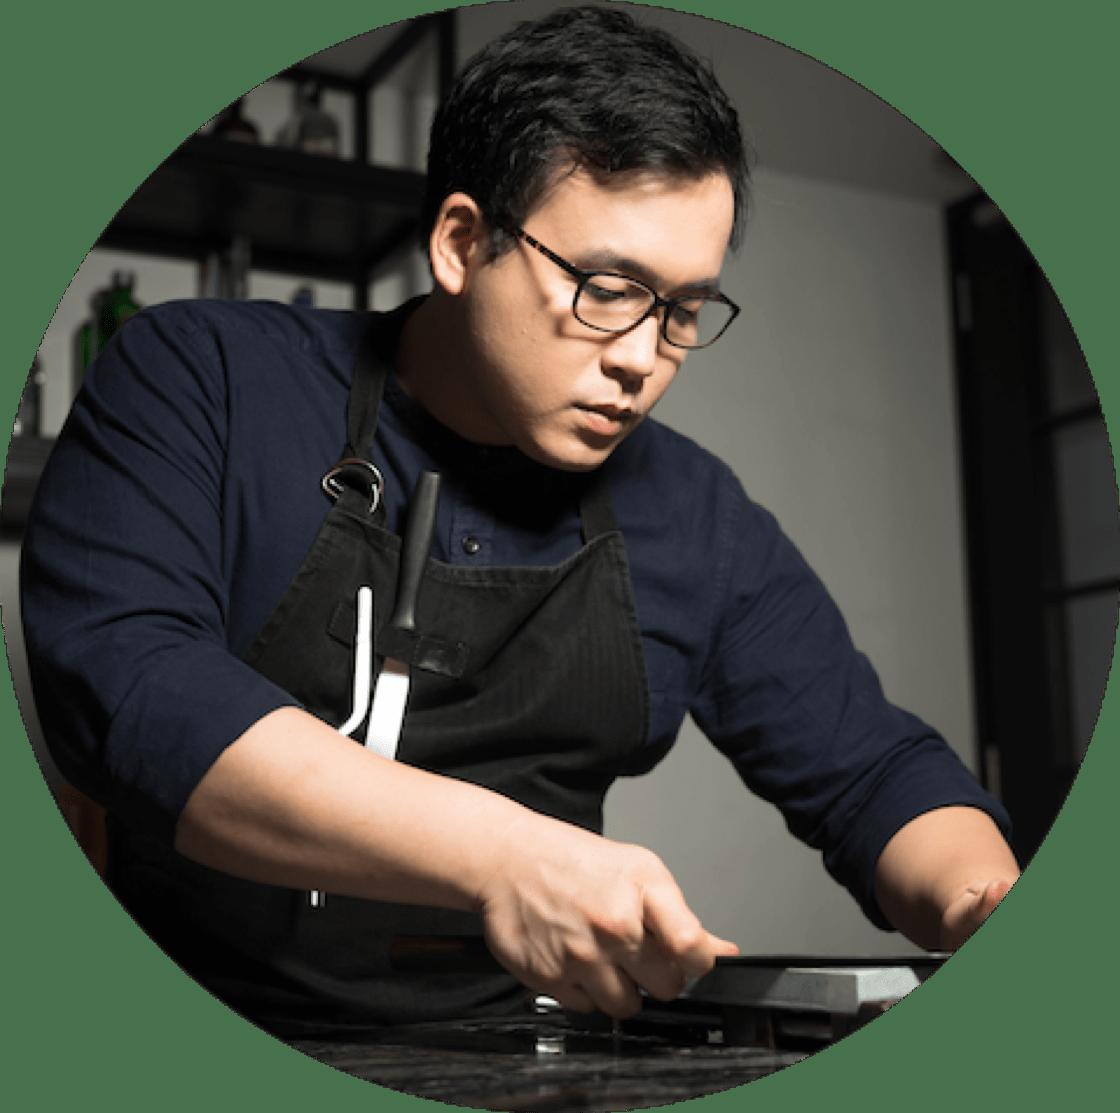 https://d3h1lg3ksw6i6b.cloudfront.net/media/image/2018/08/06/72cab5c90b0842f0bb215553bf96880c_Restaurant+Ibid+-+Chef-Owner+Woo+Wai+Leong+%283%29.png